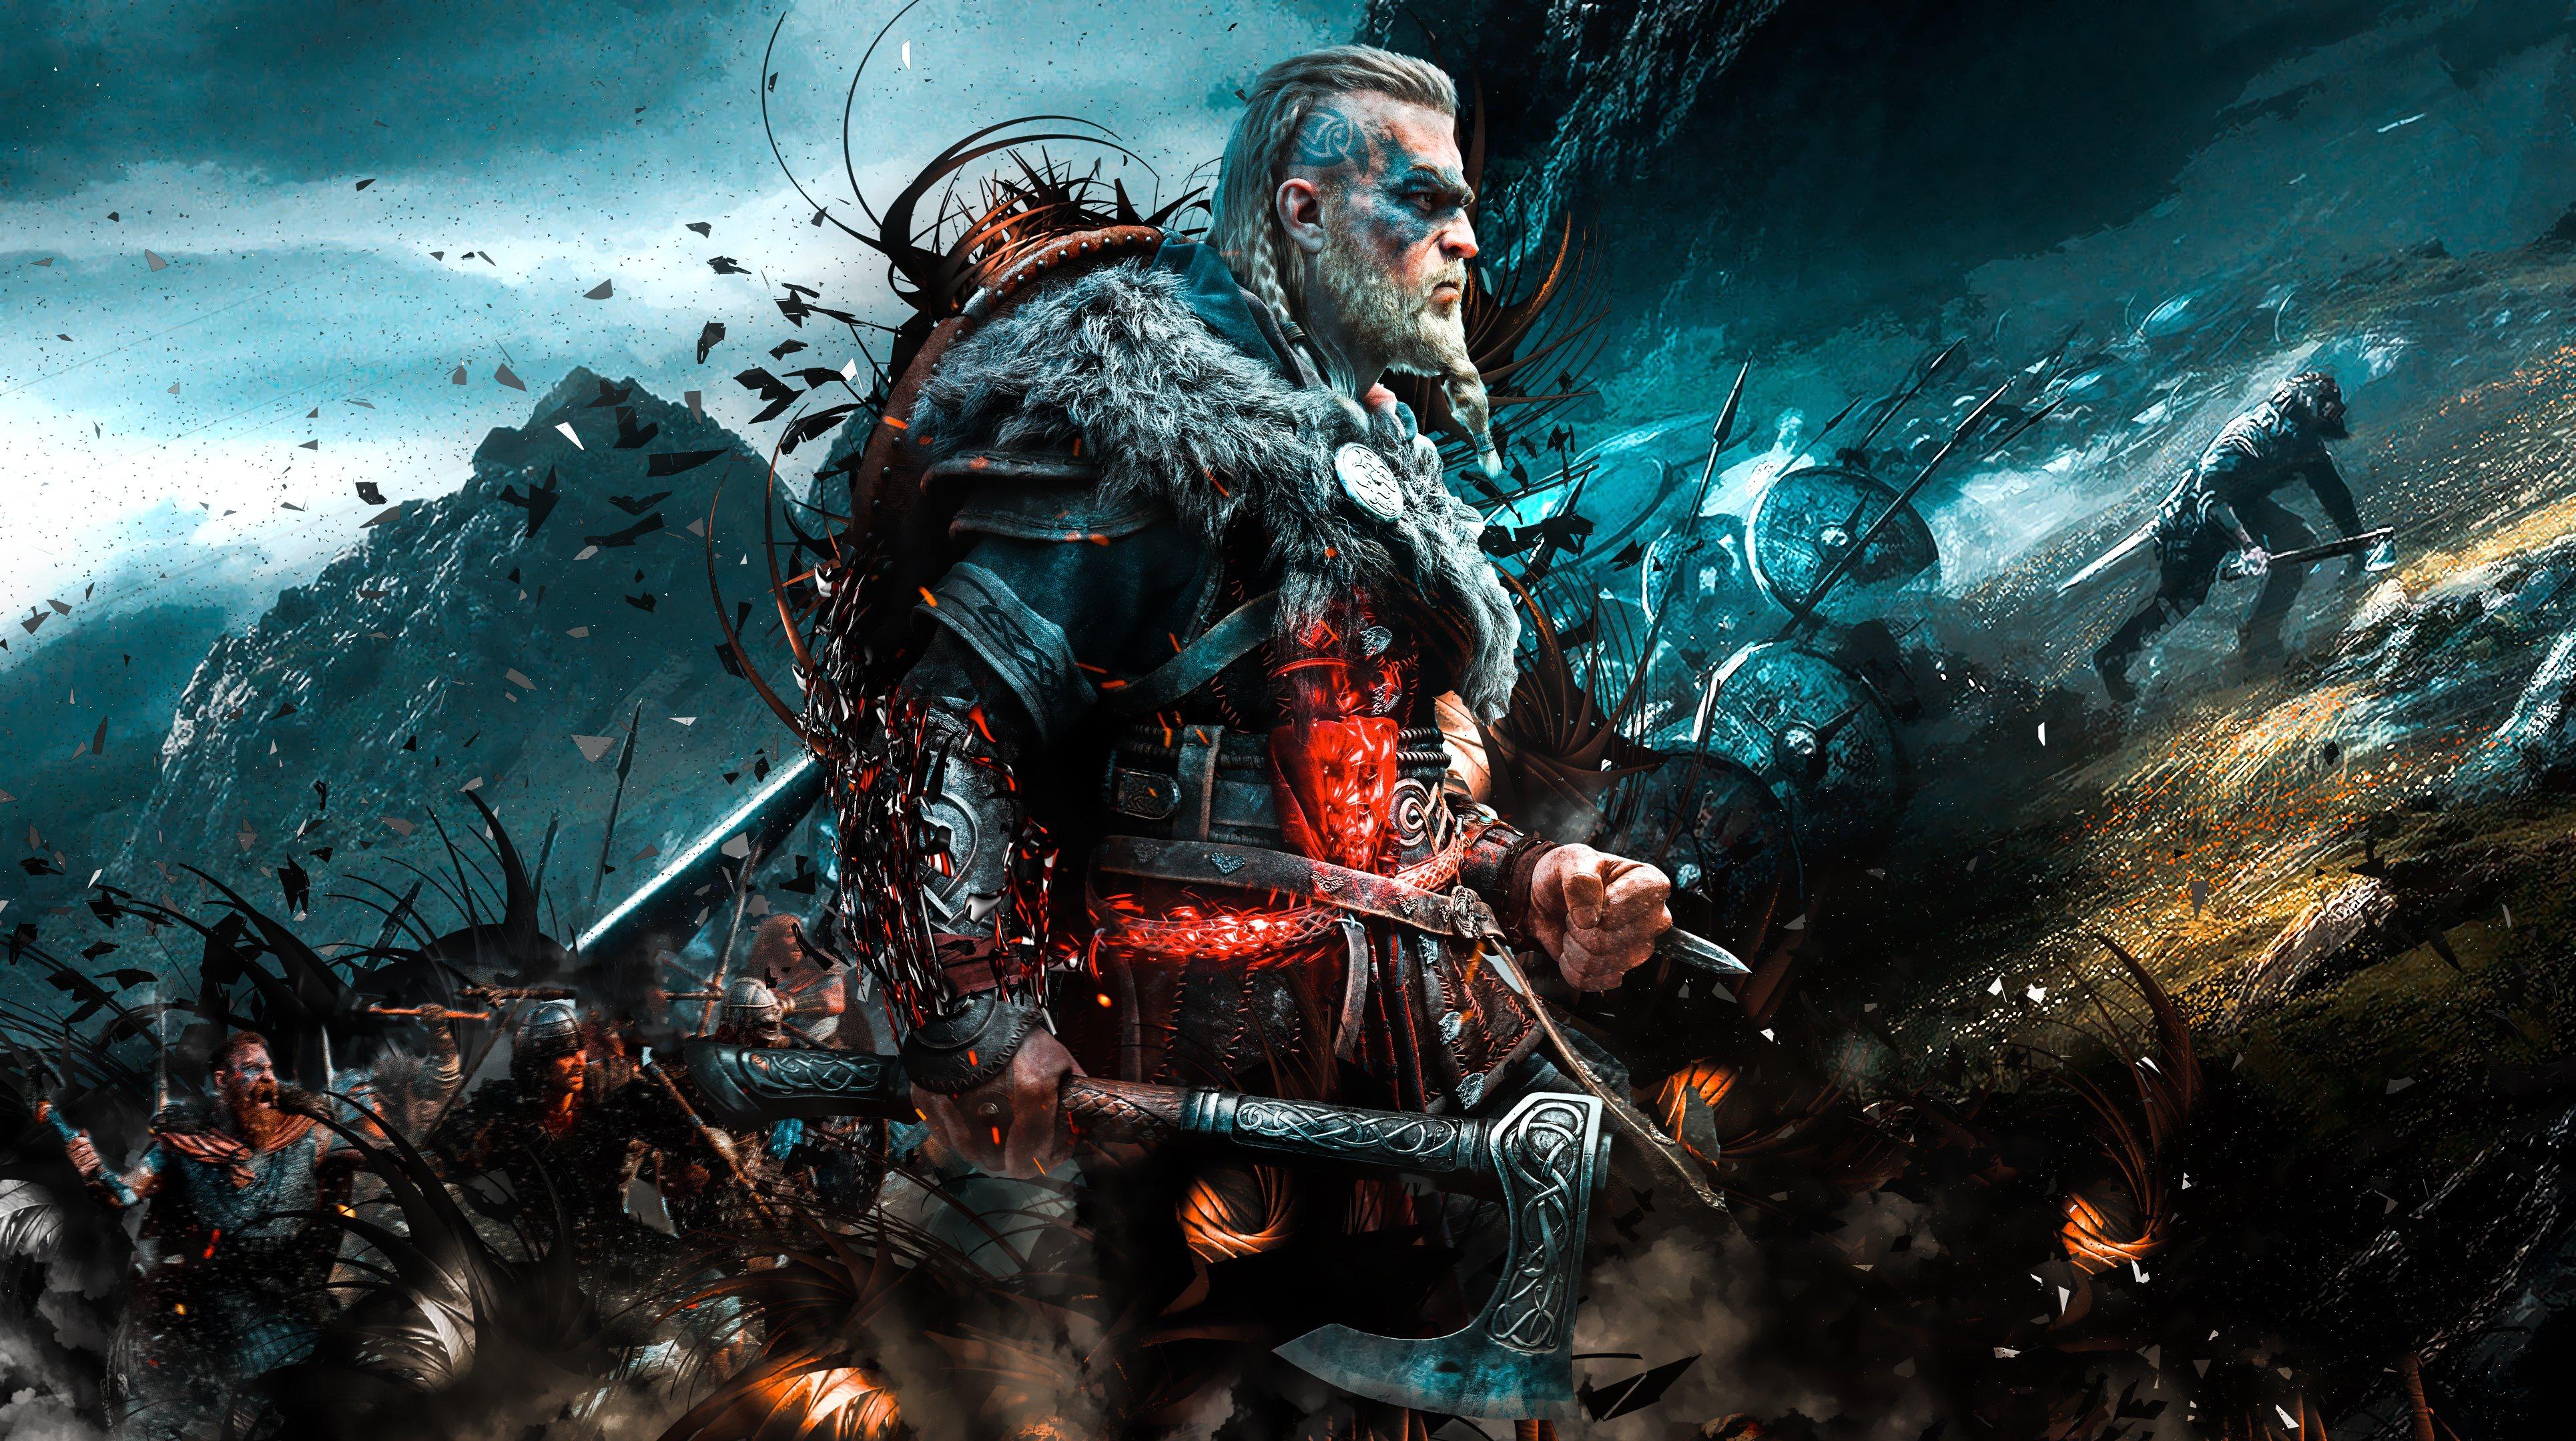 Assassins Creed Valhalla 4k Ultra HD Wallpaper Background Image 3860x2160